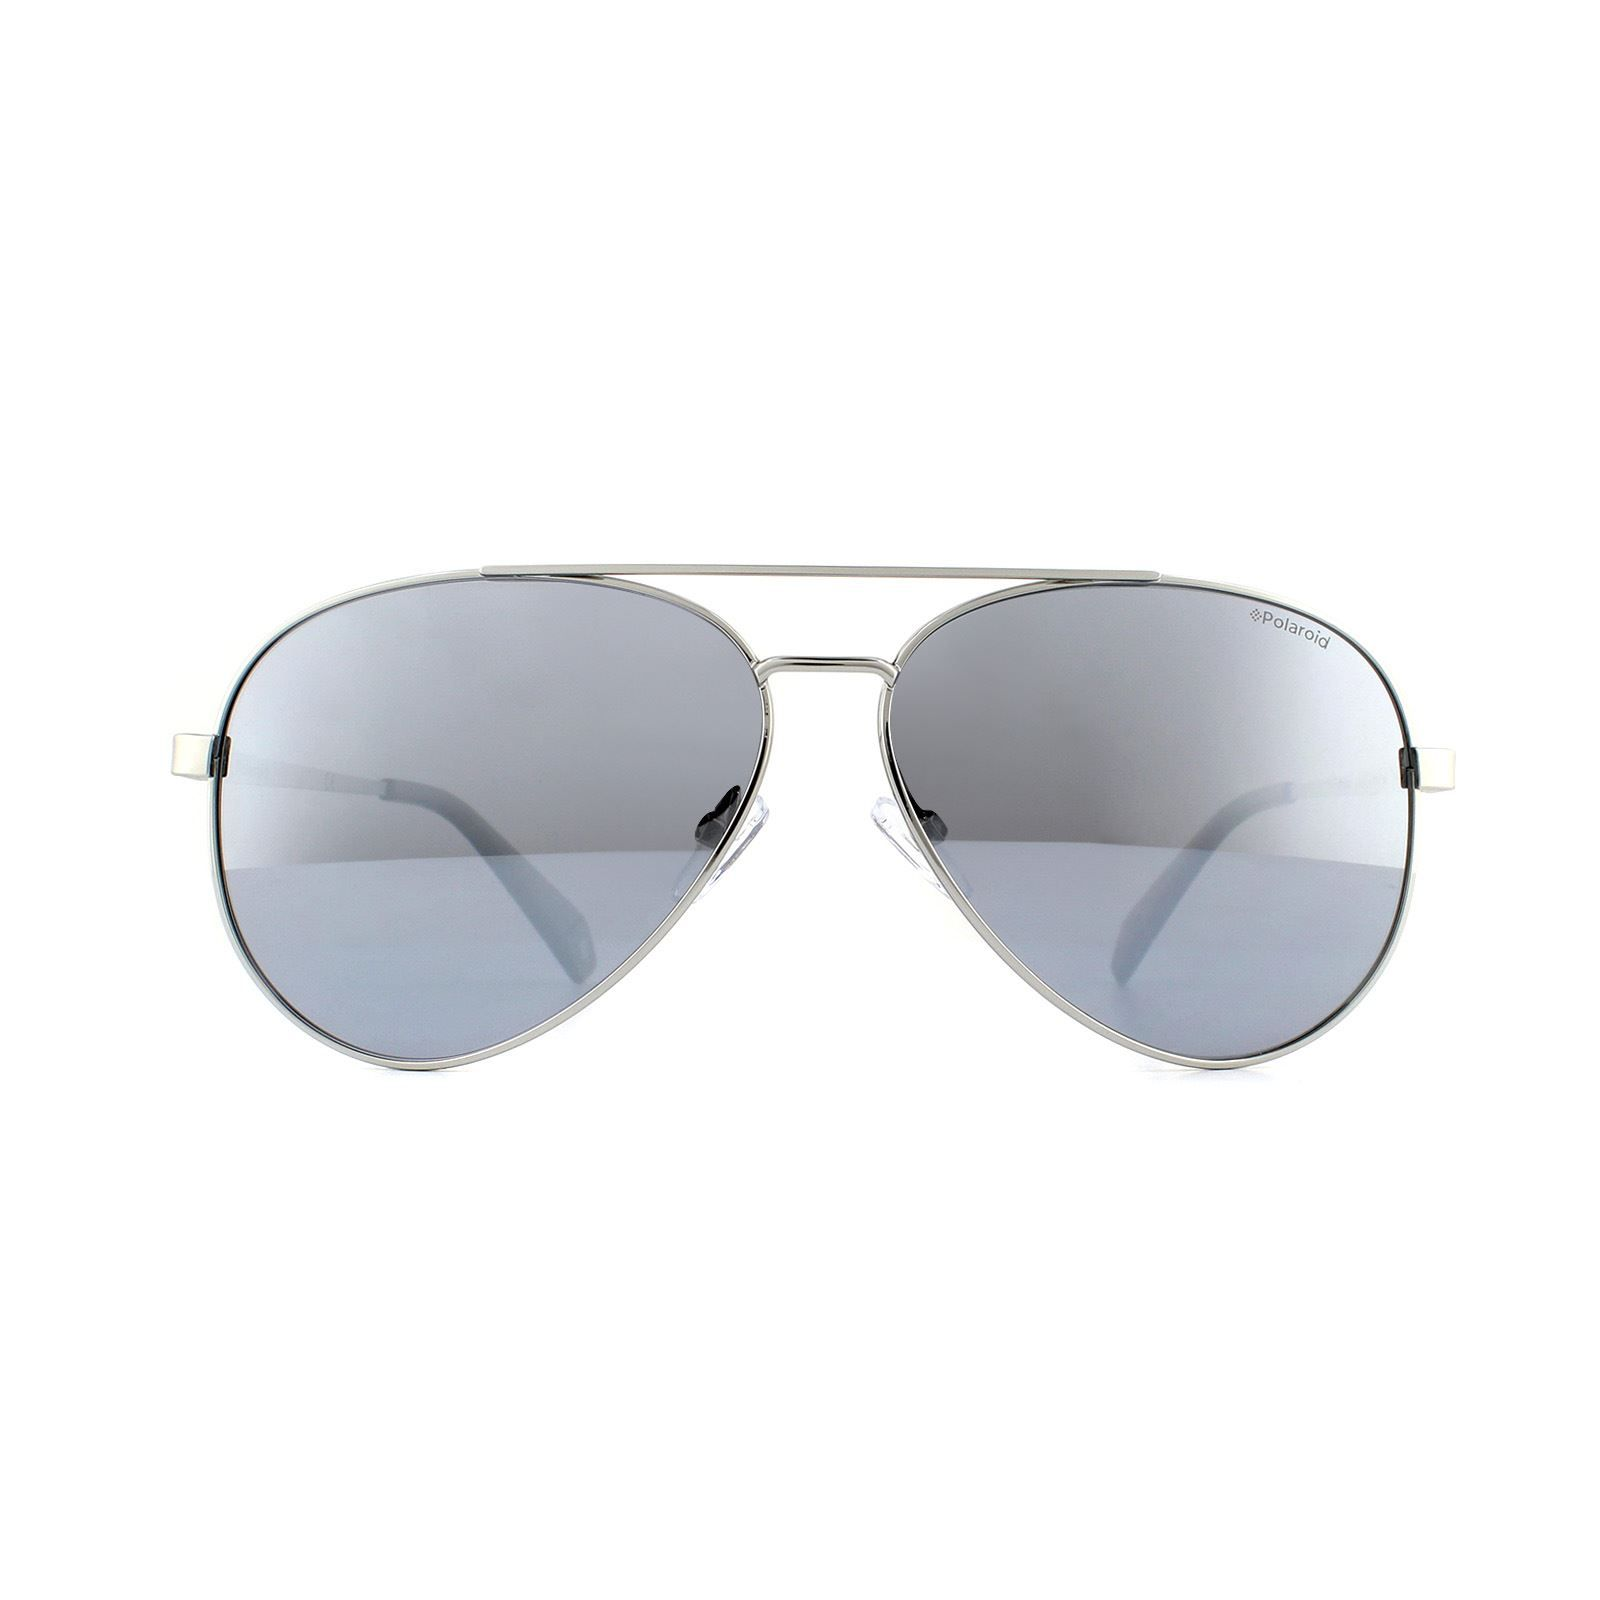 Polaroid Sunglasses PLD 6069/S/X YB7 EX Aviator Silver Grey Silver Mirror Polarized